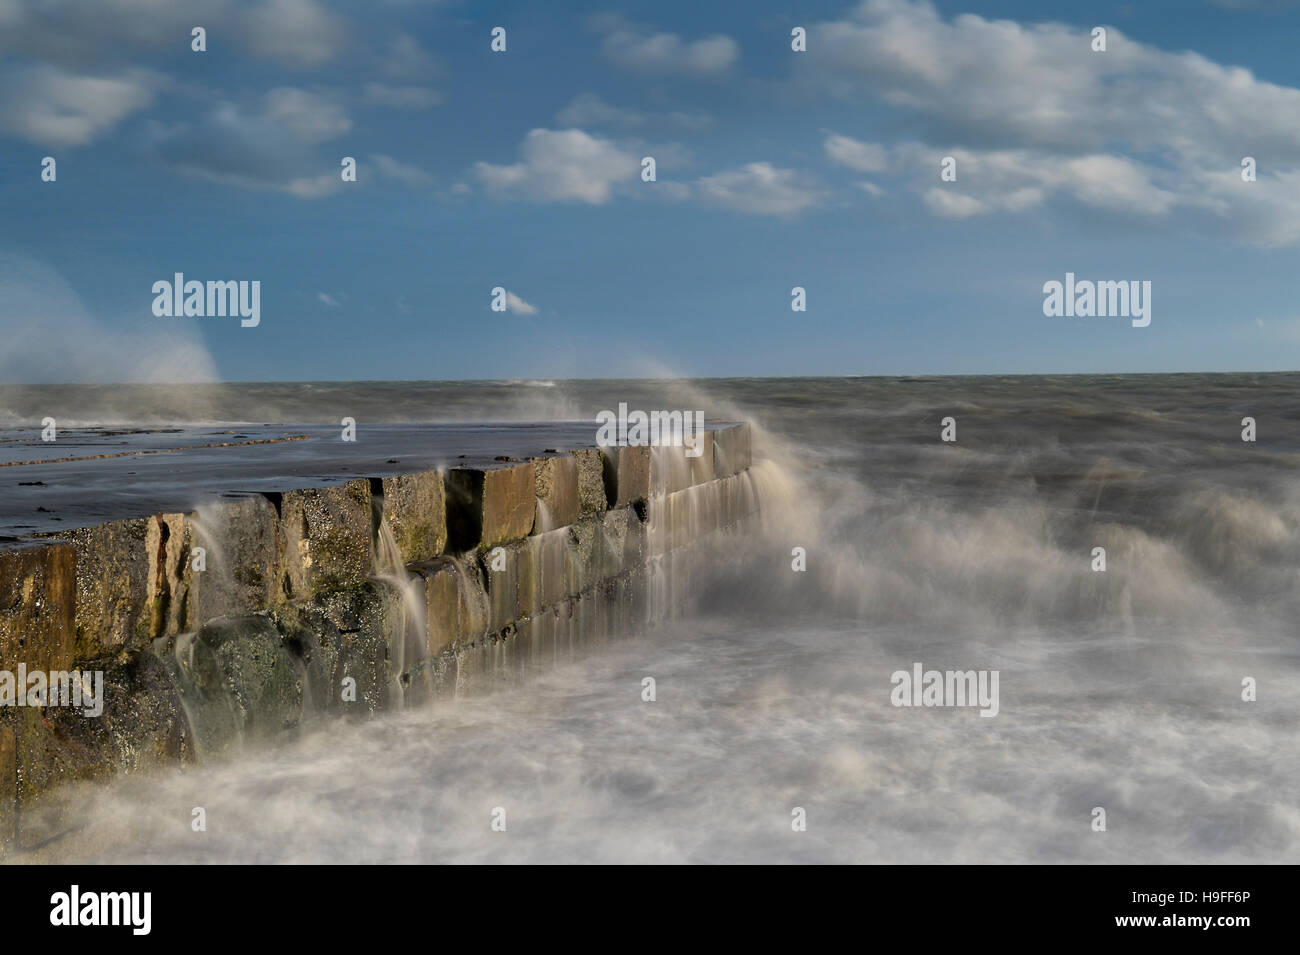 Tide breaks over the apron at Folkestone Warren, Kent. - Stock Image